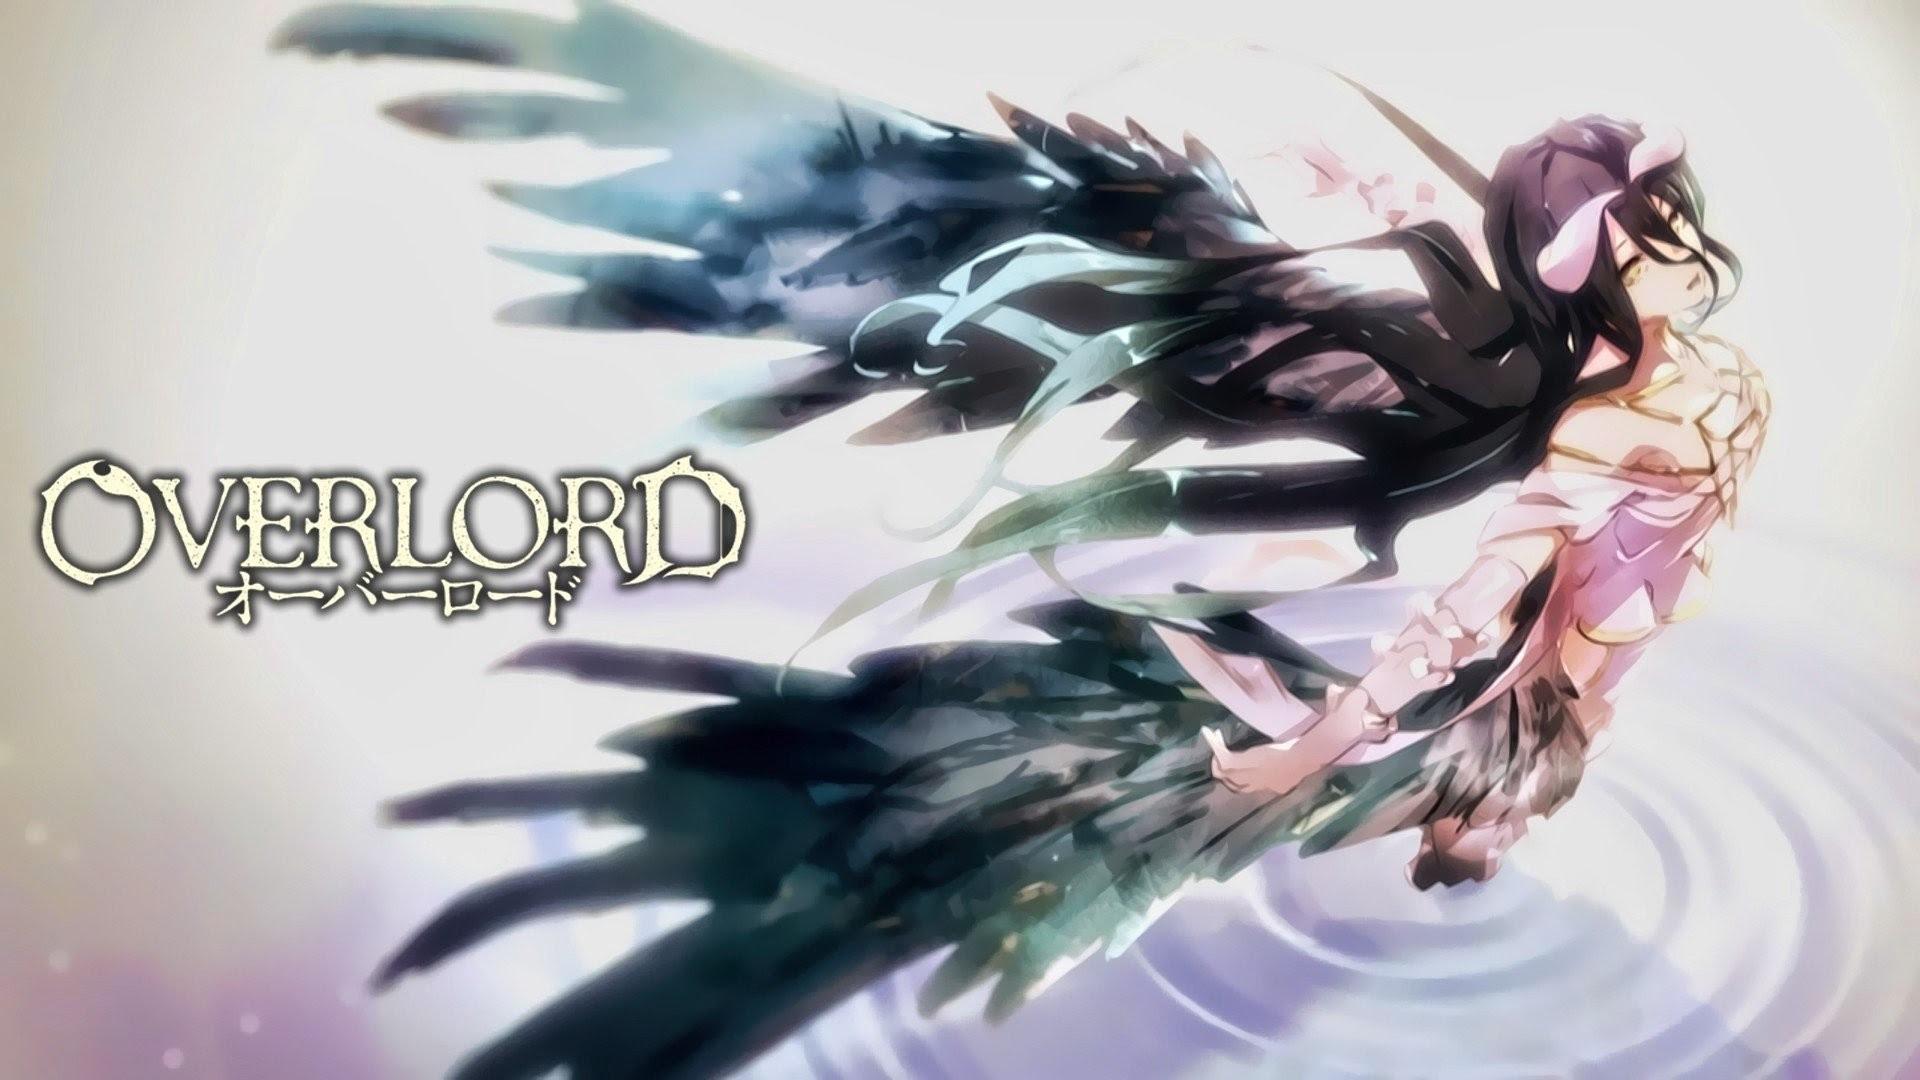 Background Overlord Anime Wallpaper Gambarku